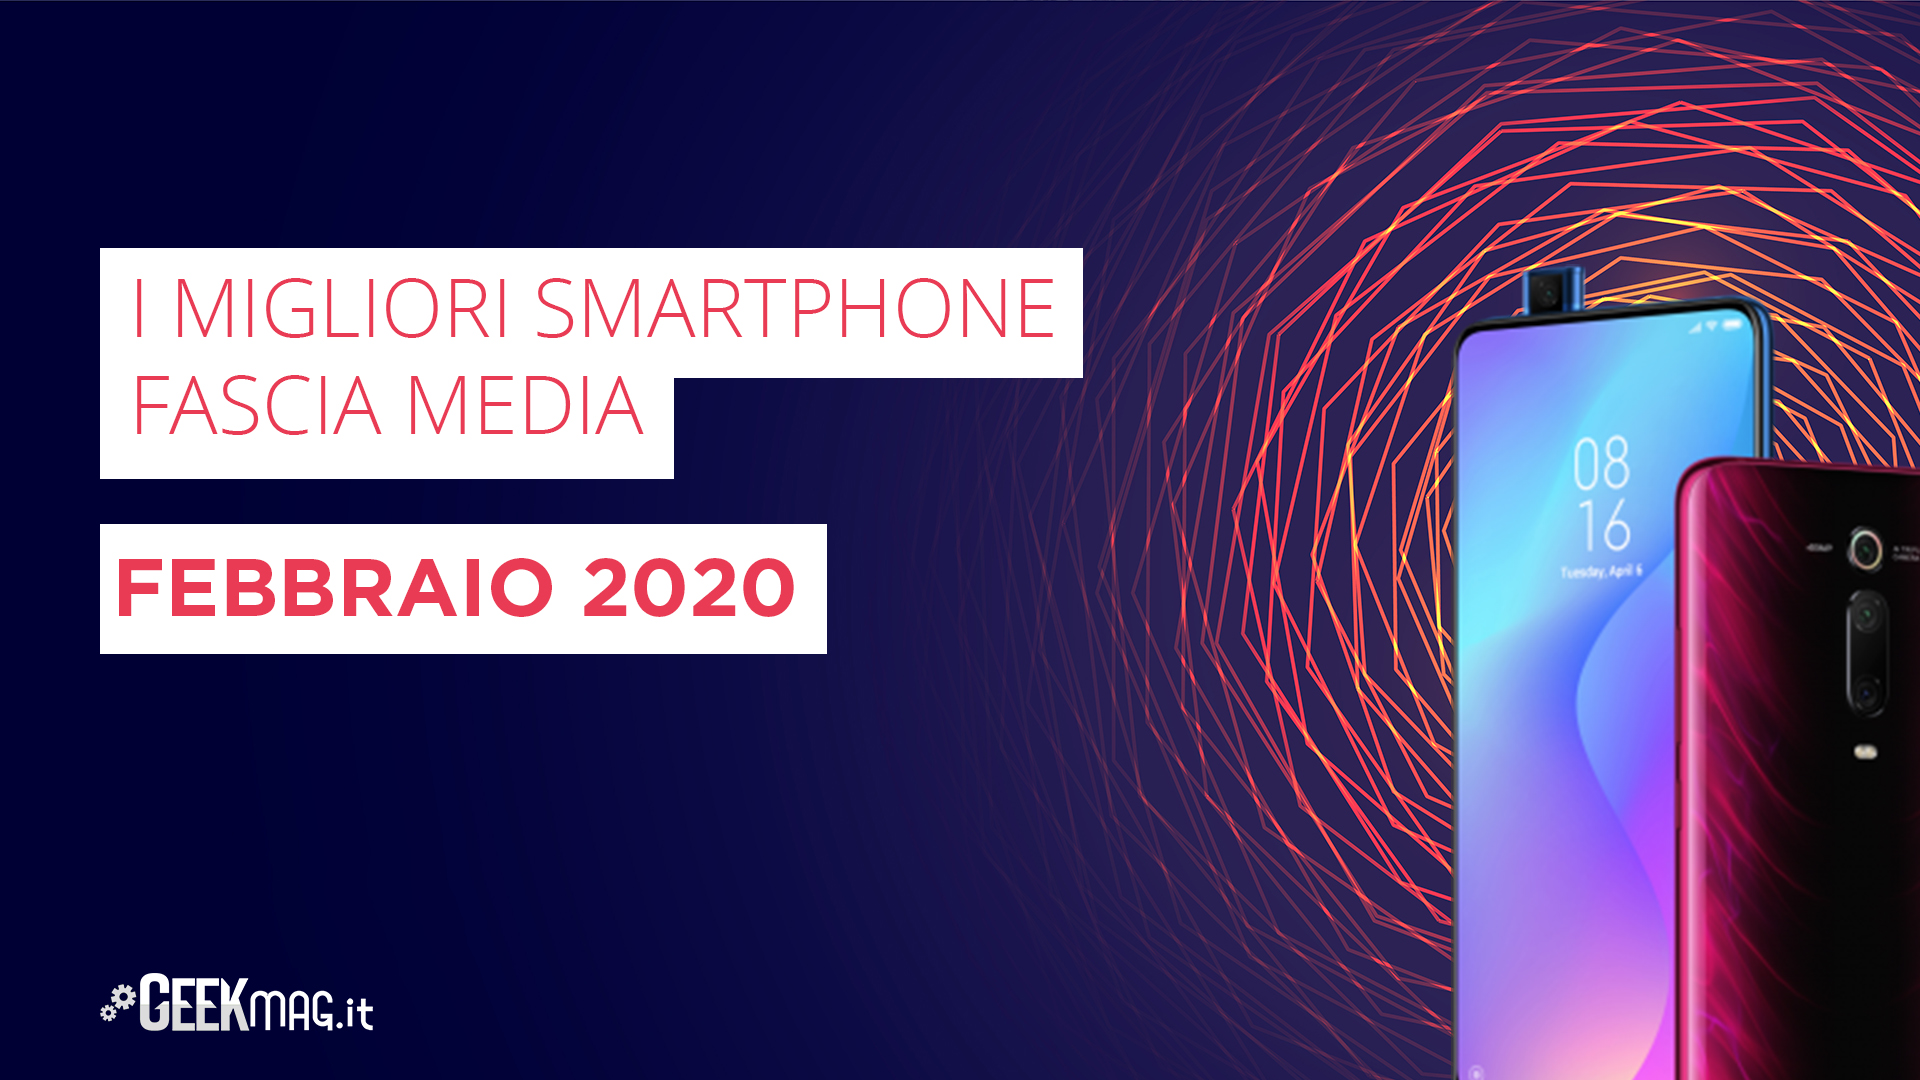 I migliori Smartphone Fascia Media Febbraio 2020 GeekMag.it